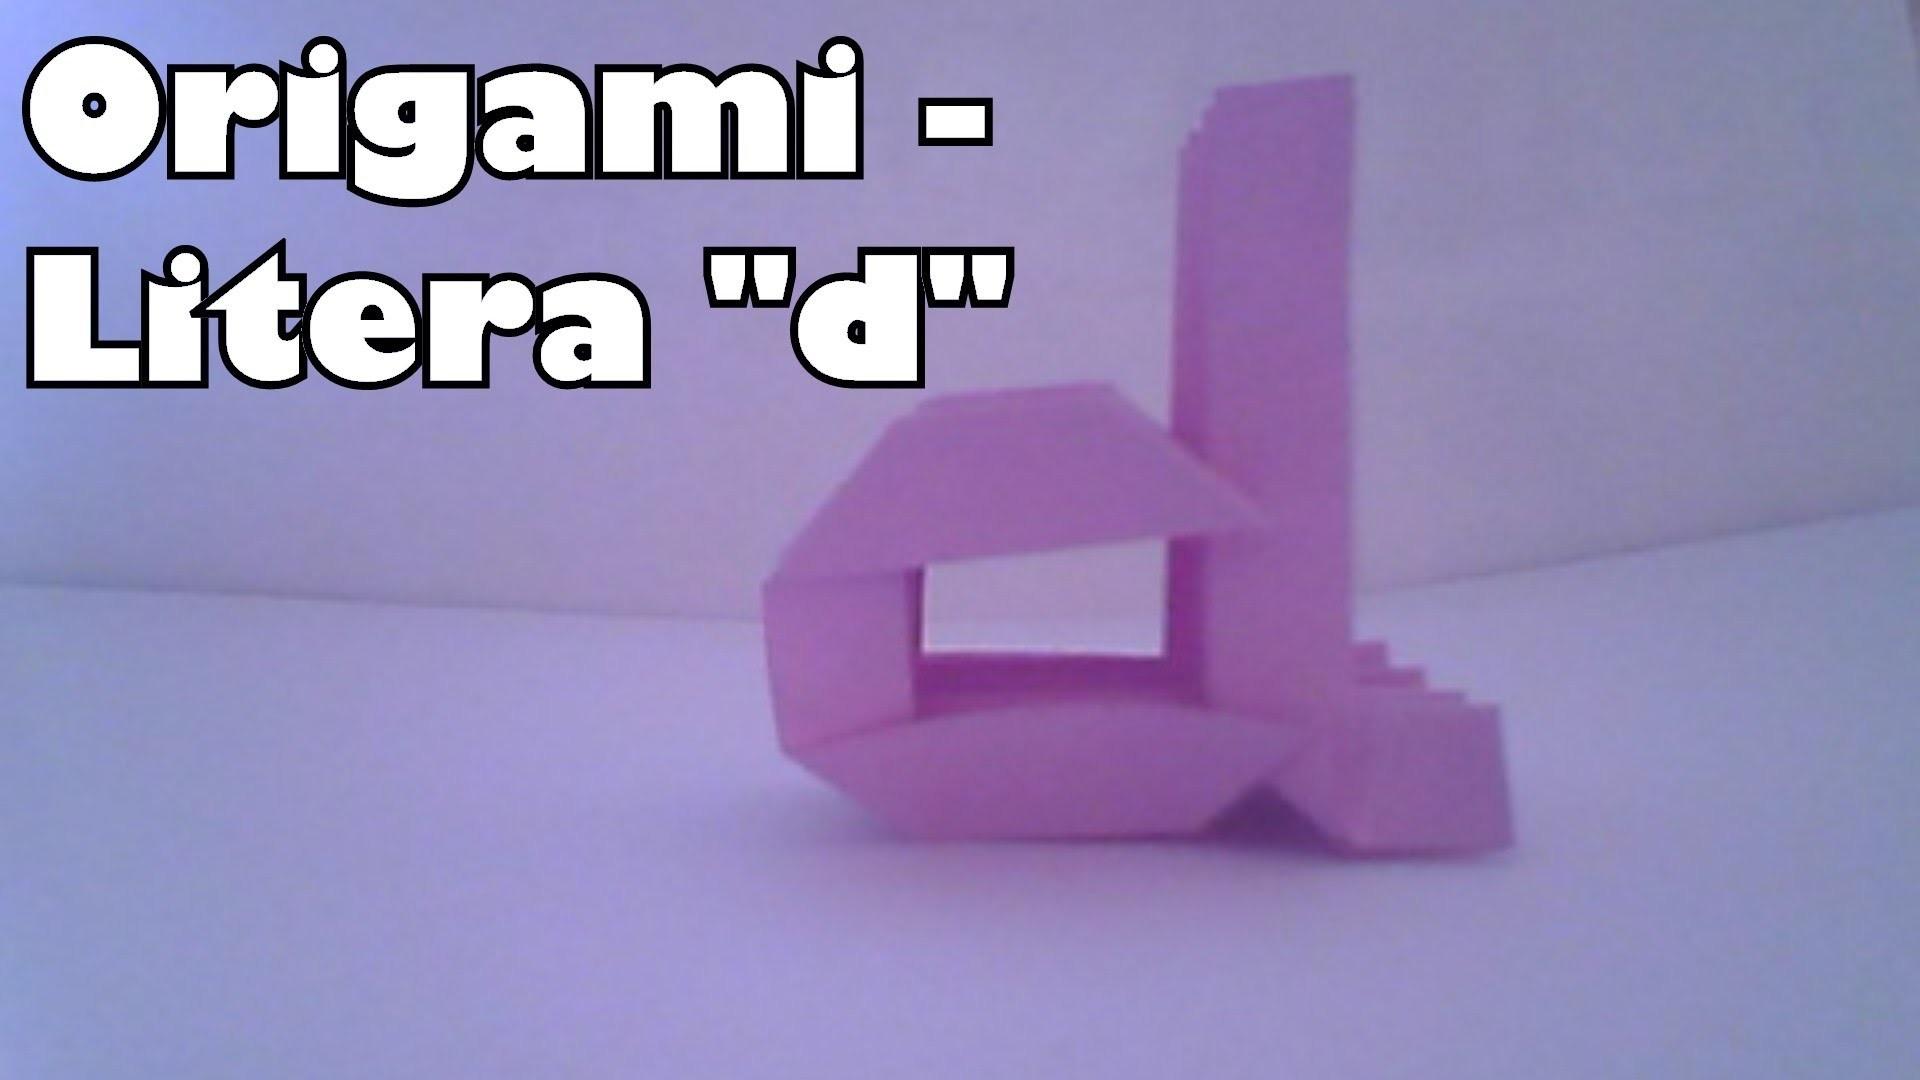 Origami - Litera